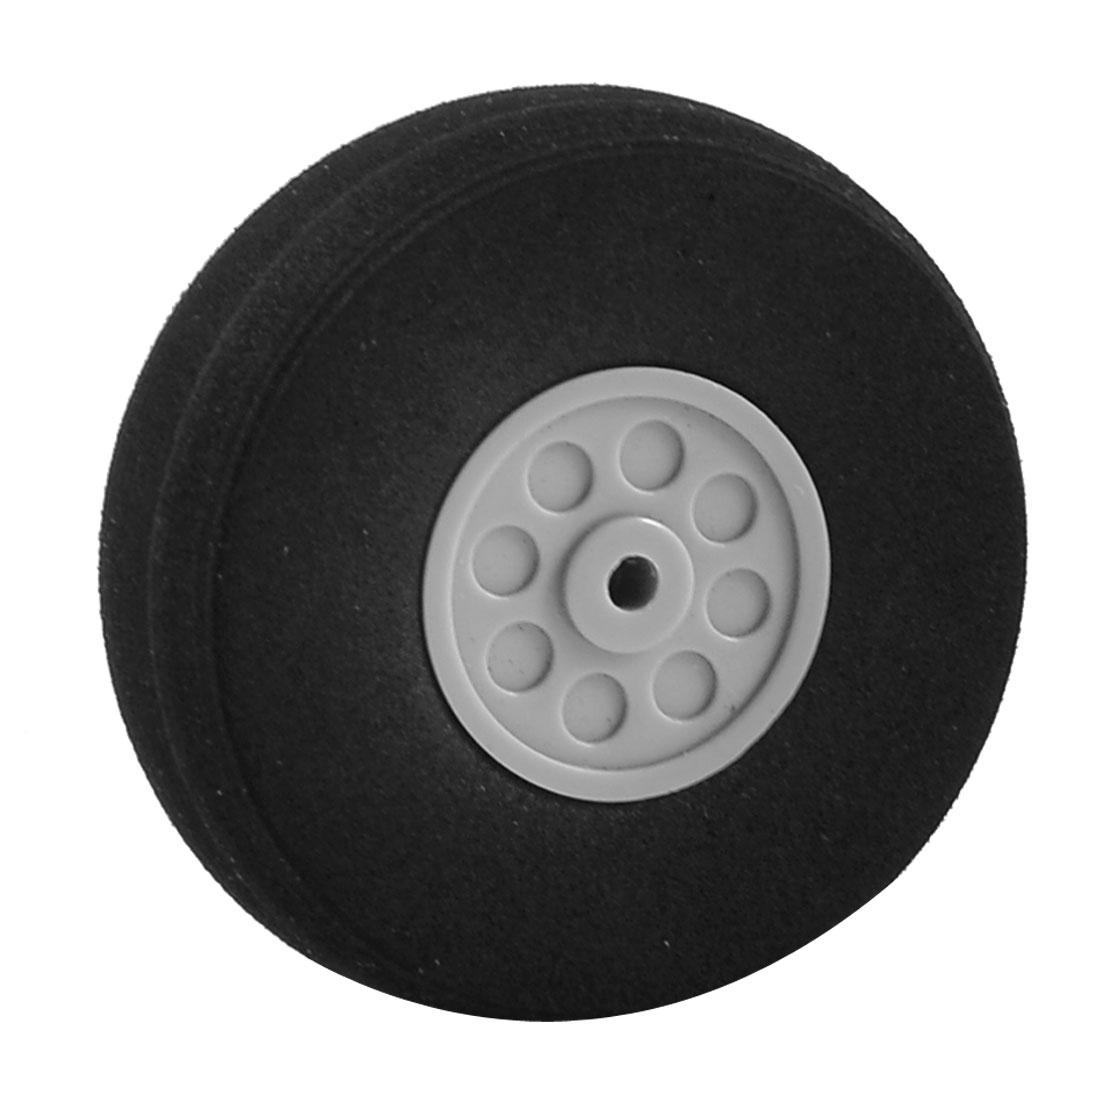 Gray Plastic Hub Black Foam Wheel 55mm Diameter for RC Aircraft Model Toy